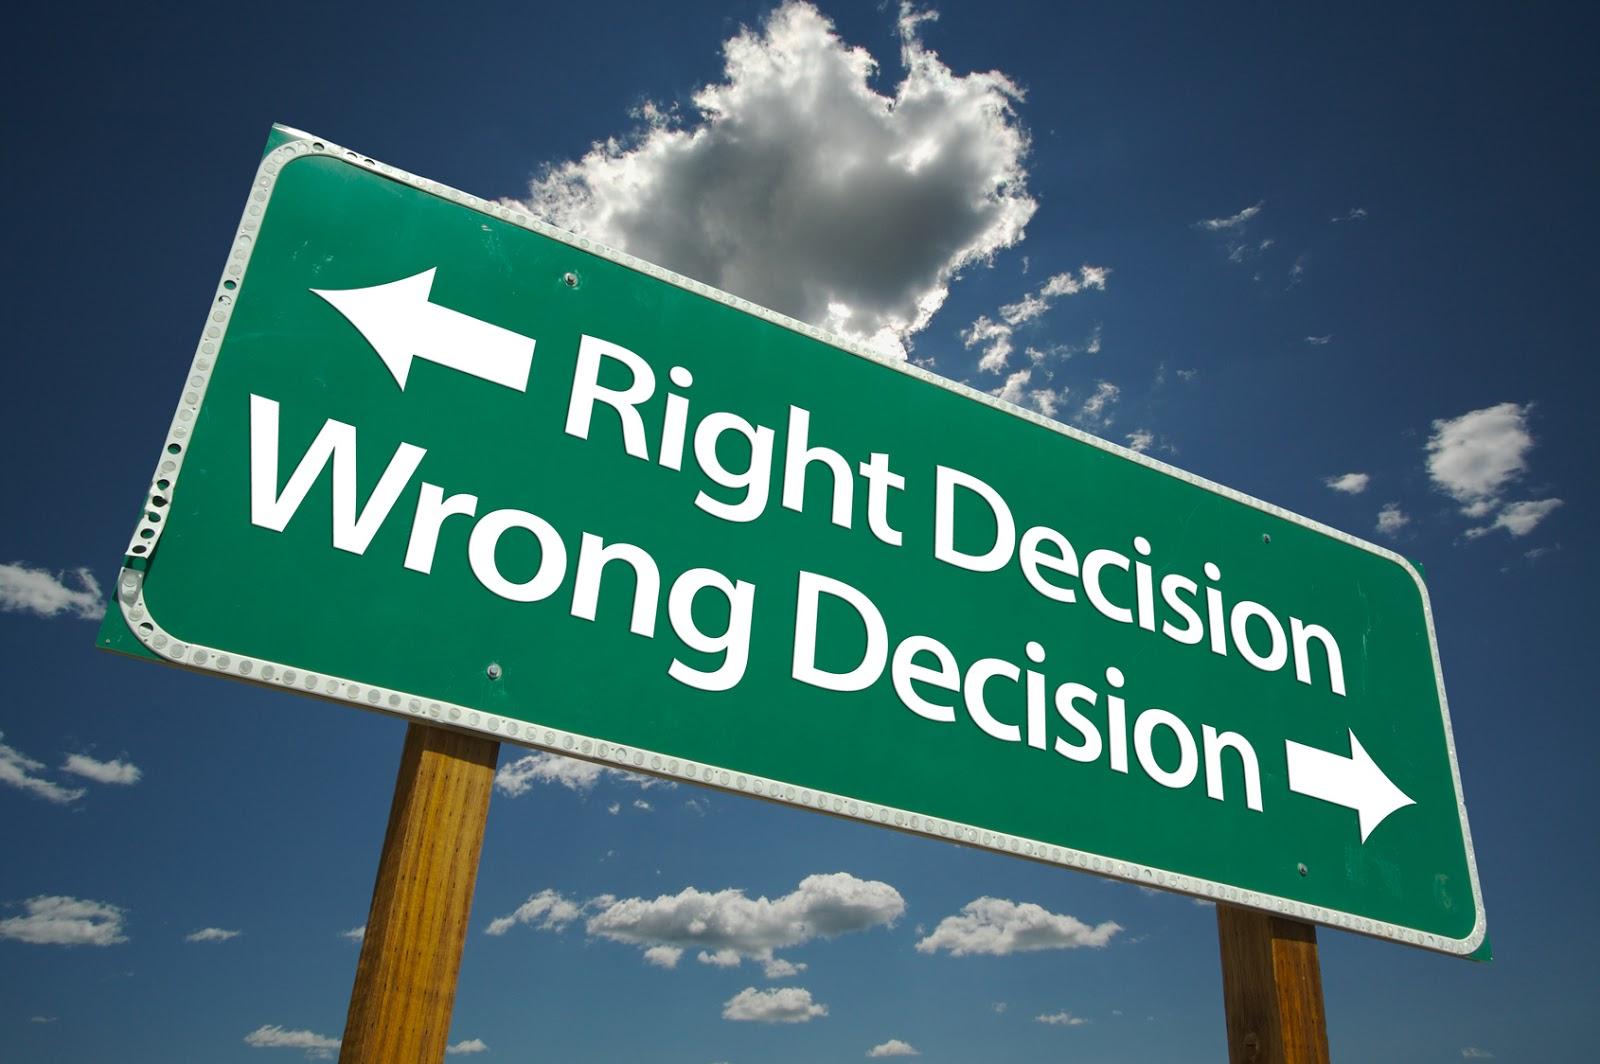 How does your knowledge of economics shape ur decisions?